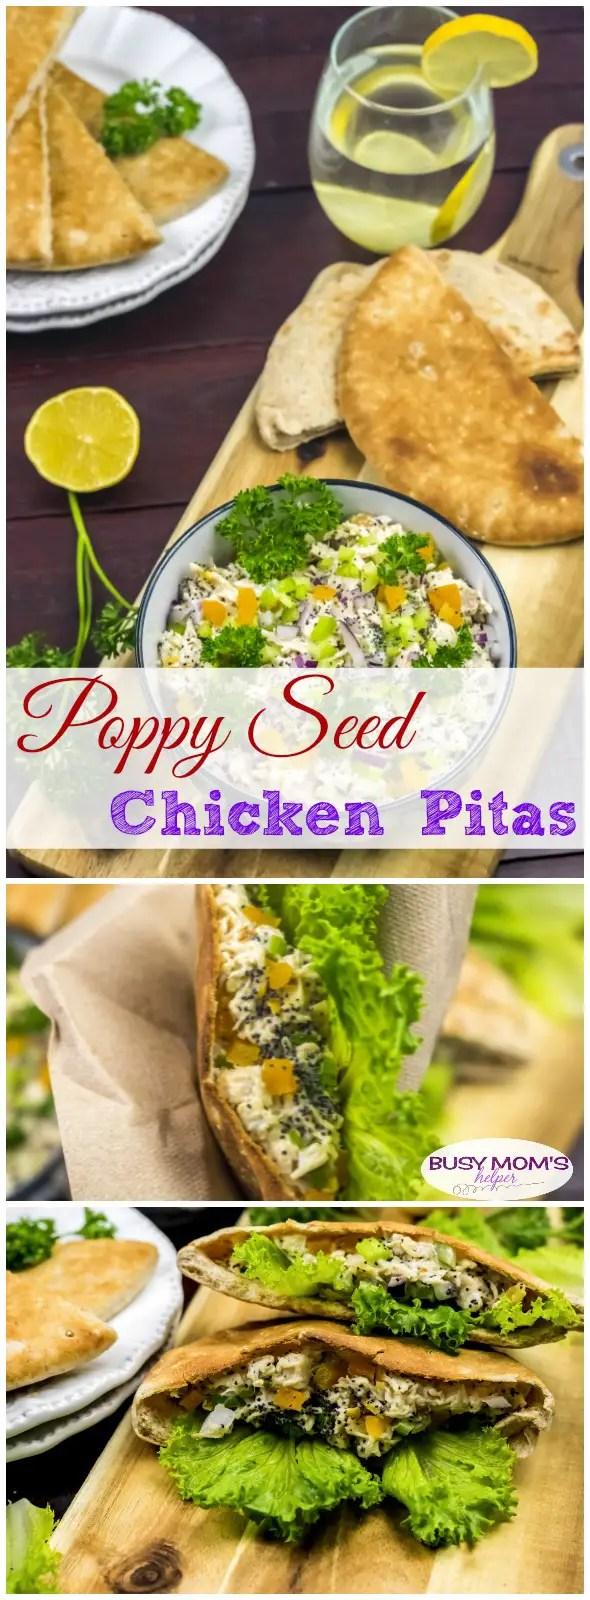 Poppy Seed Chicken Pitas